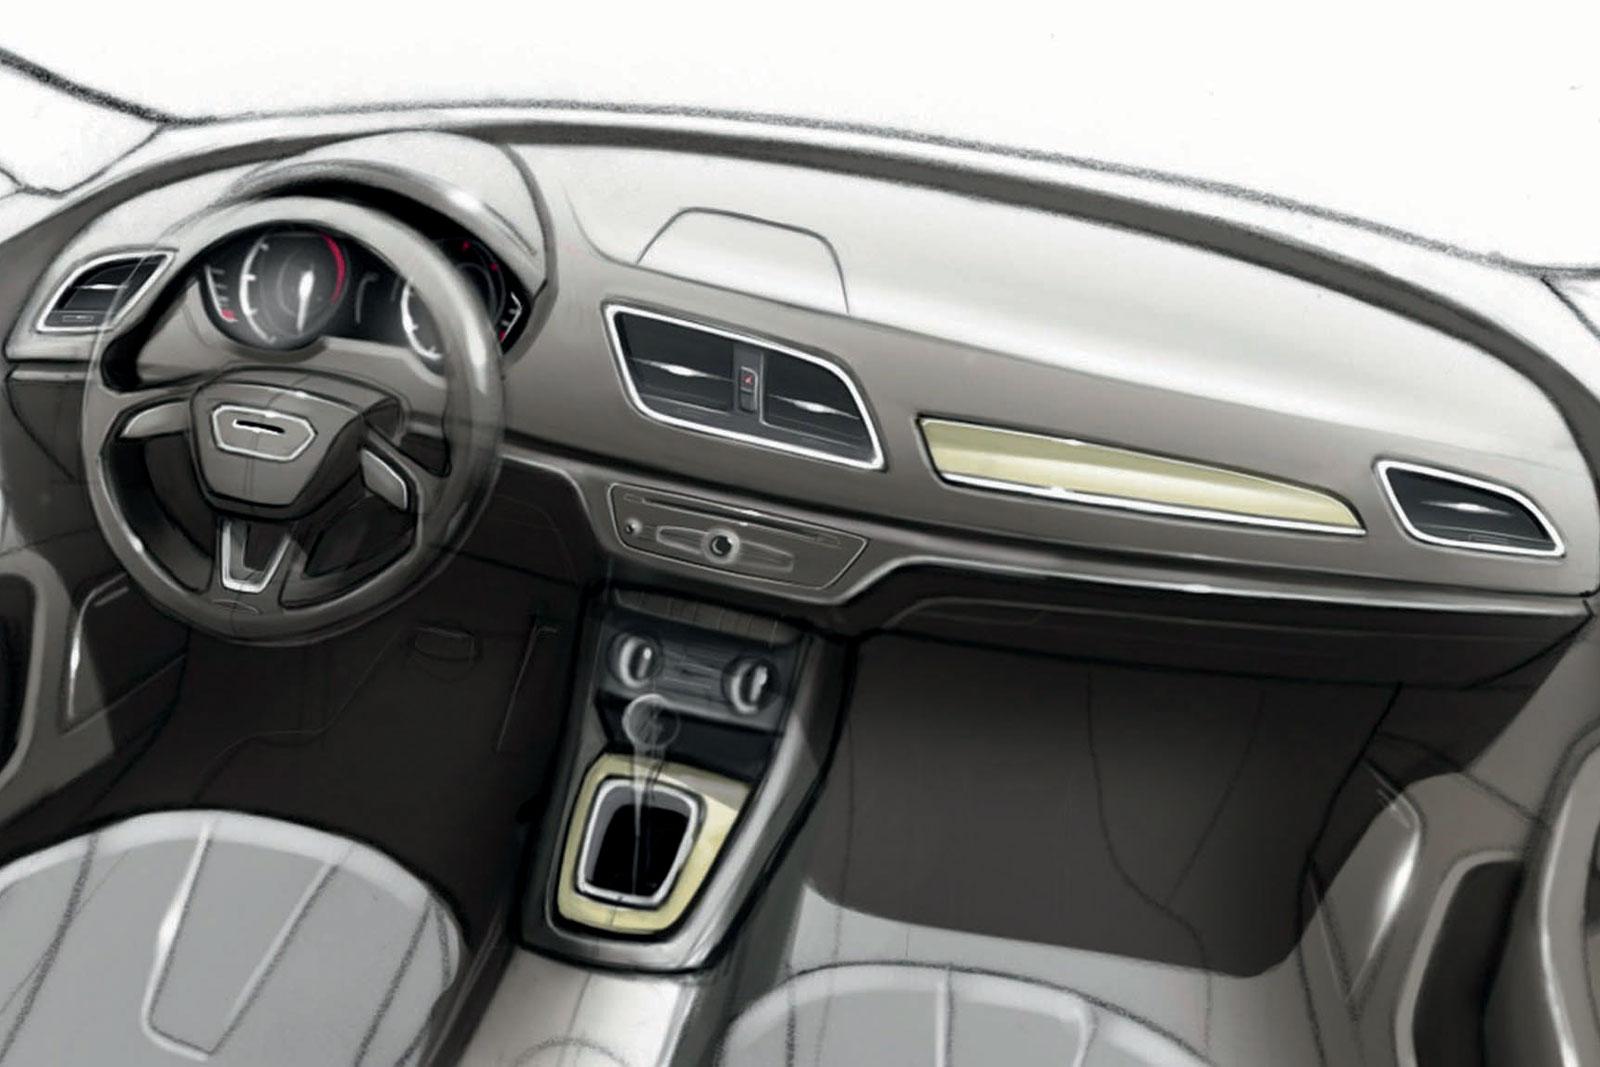 car design scoop scoop et dernieres infos automobile nouvelle audi q3 scoop officiel. Black Bedroom Furniture Sets. Home Design Ideas